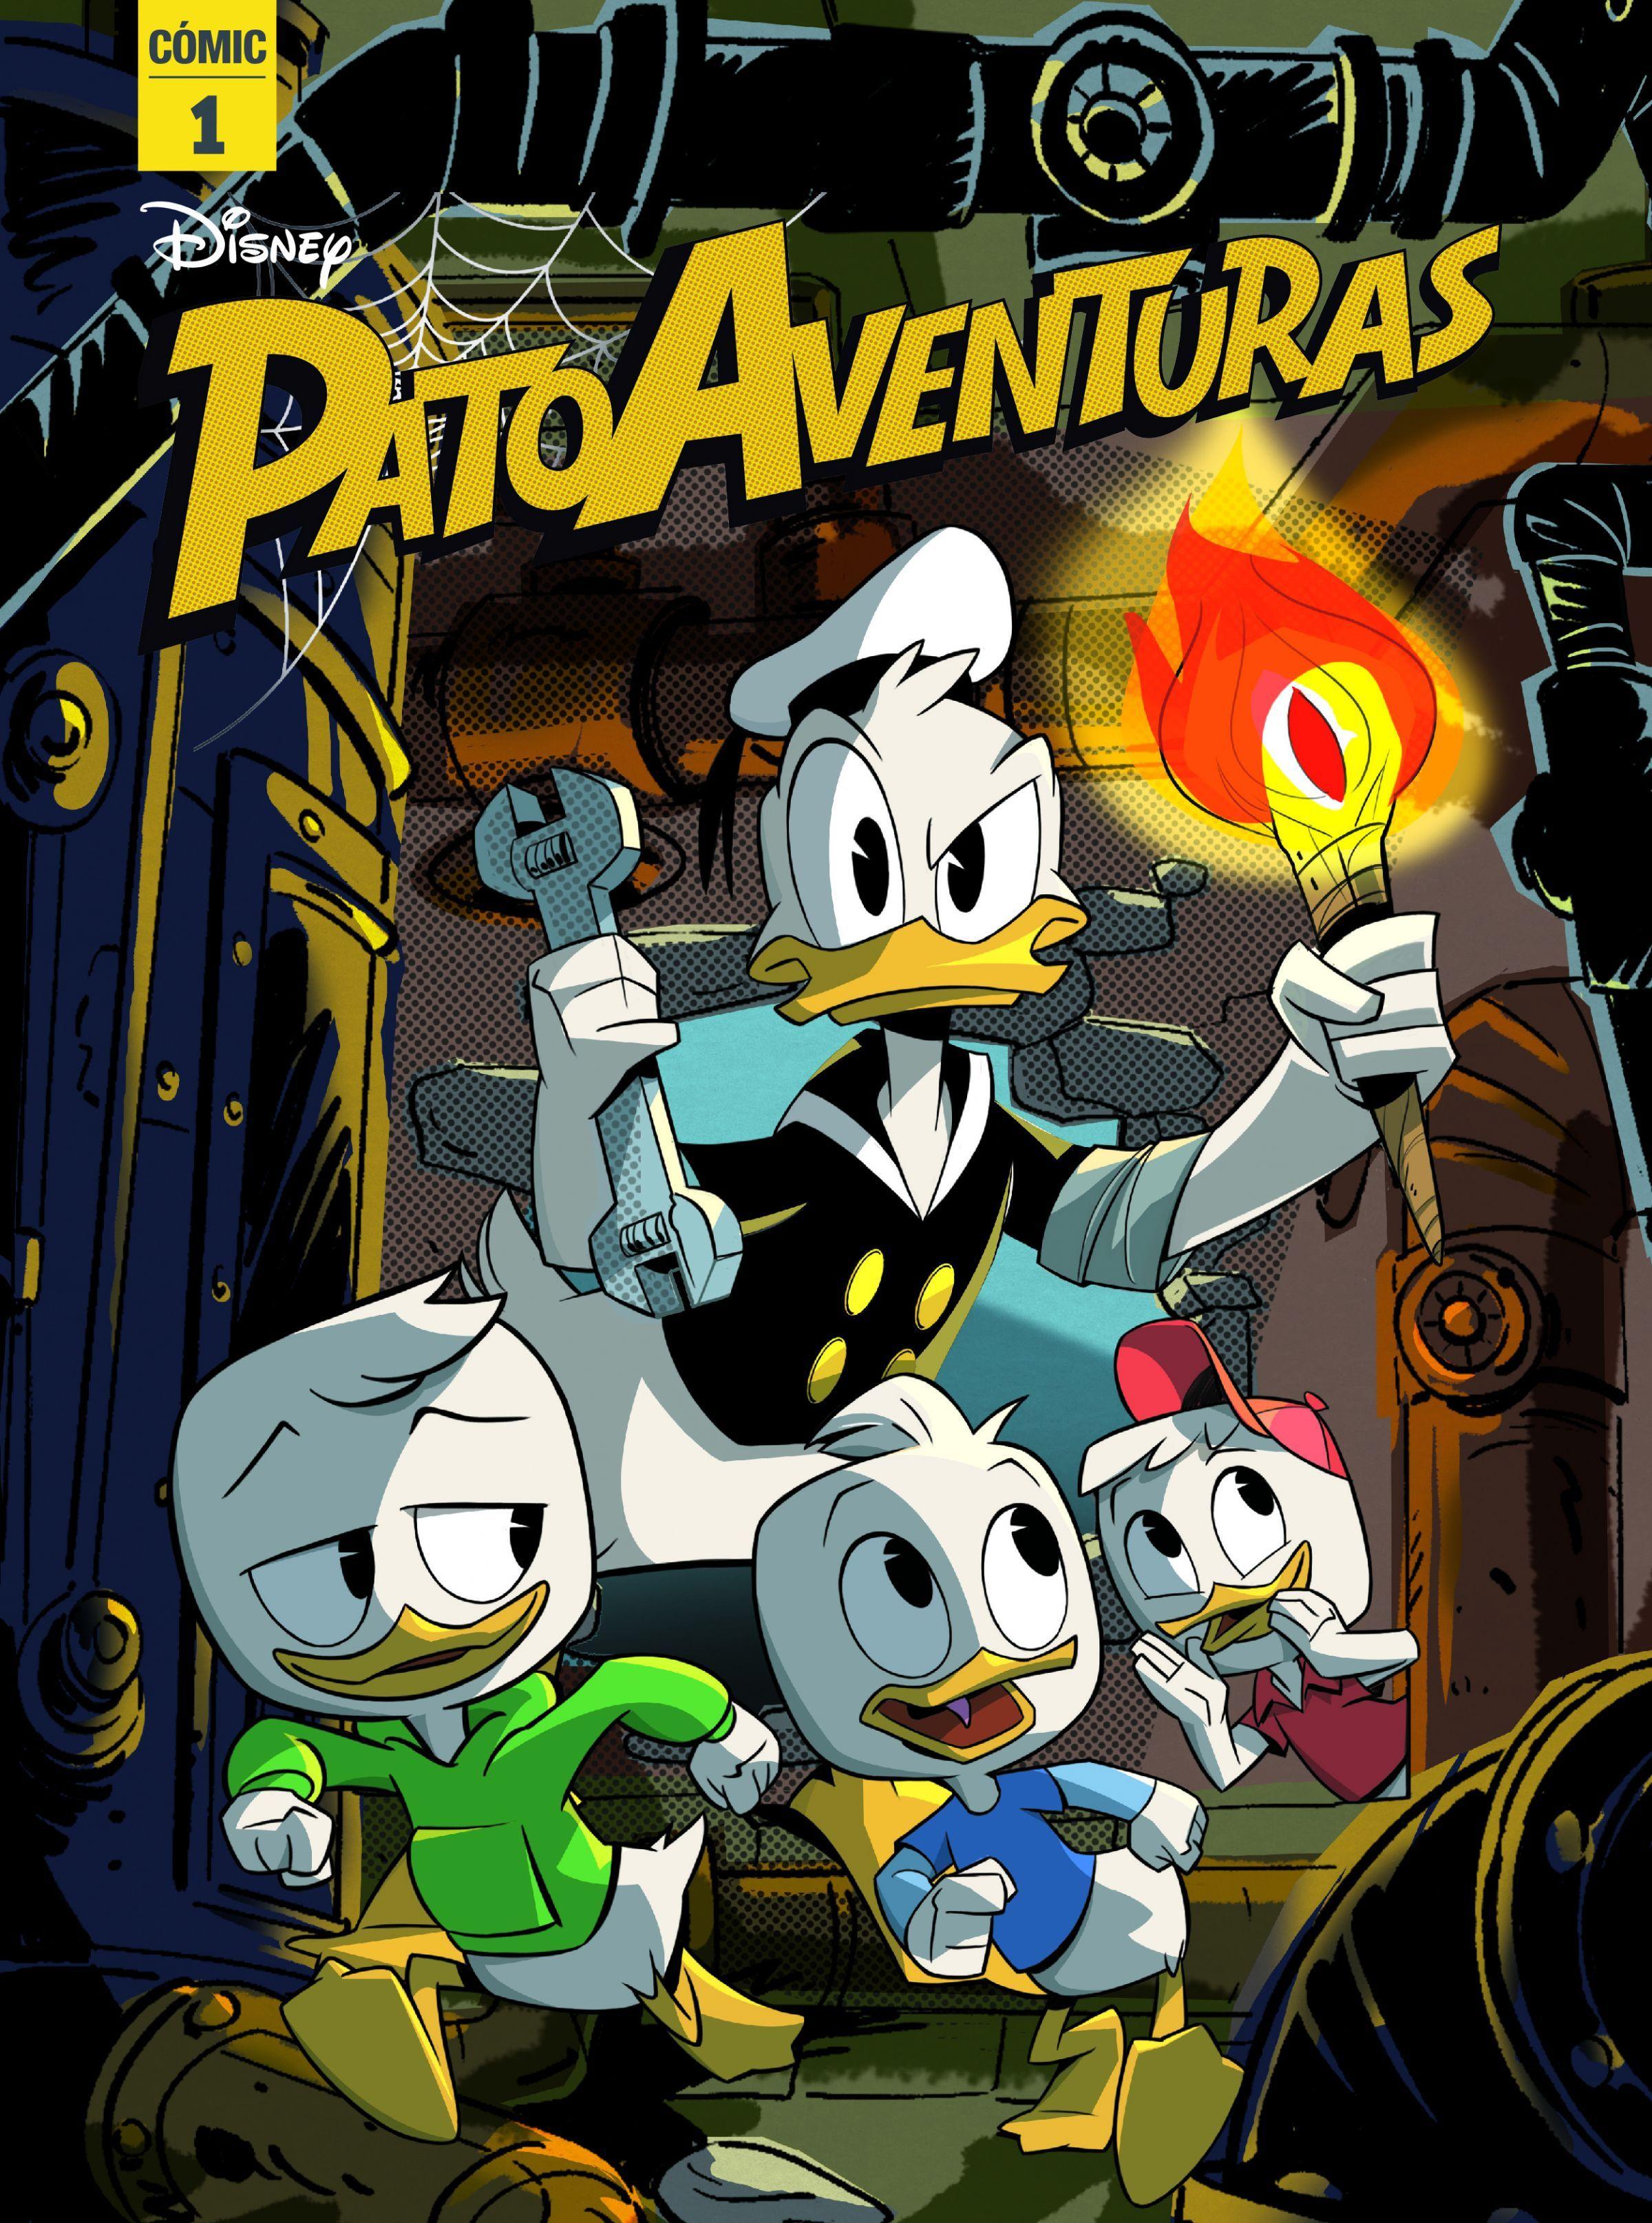 Patoaventuras 1 - Disney - Planeta Junior